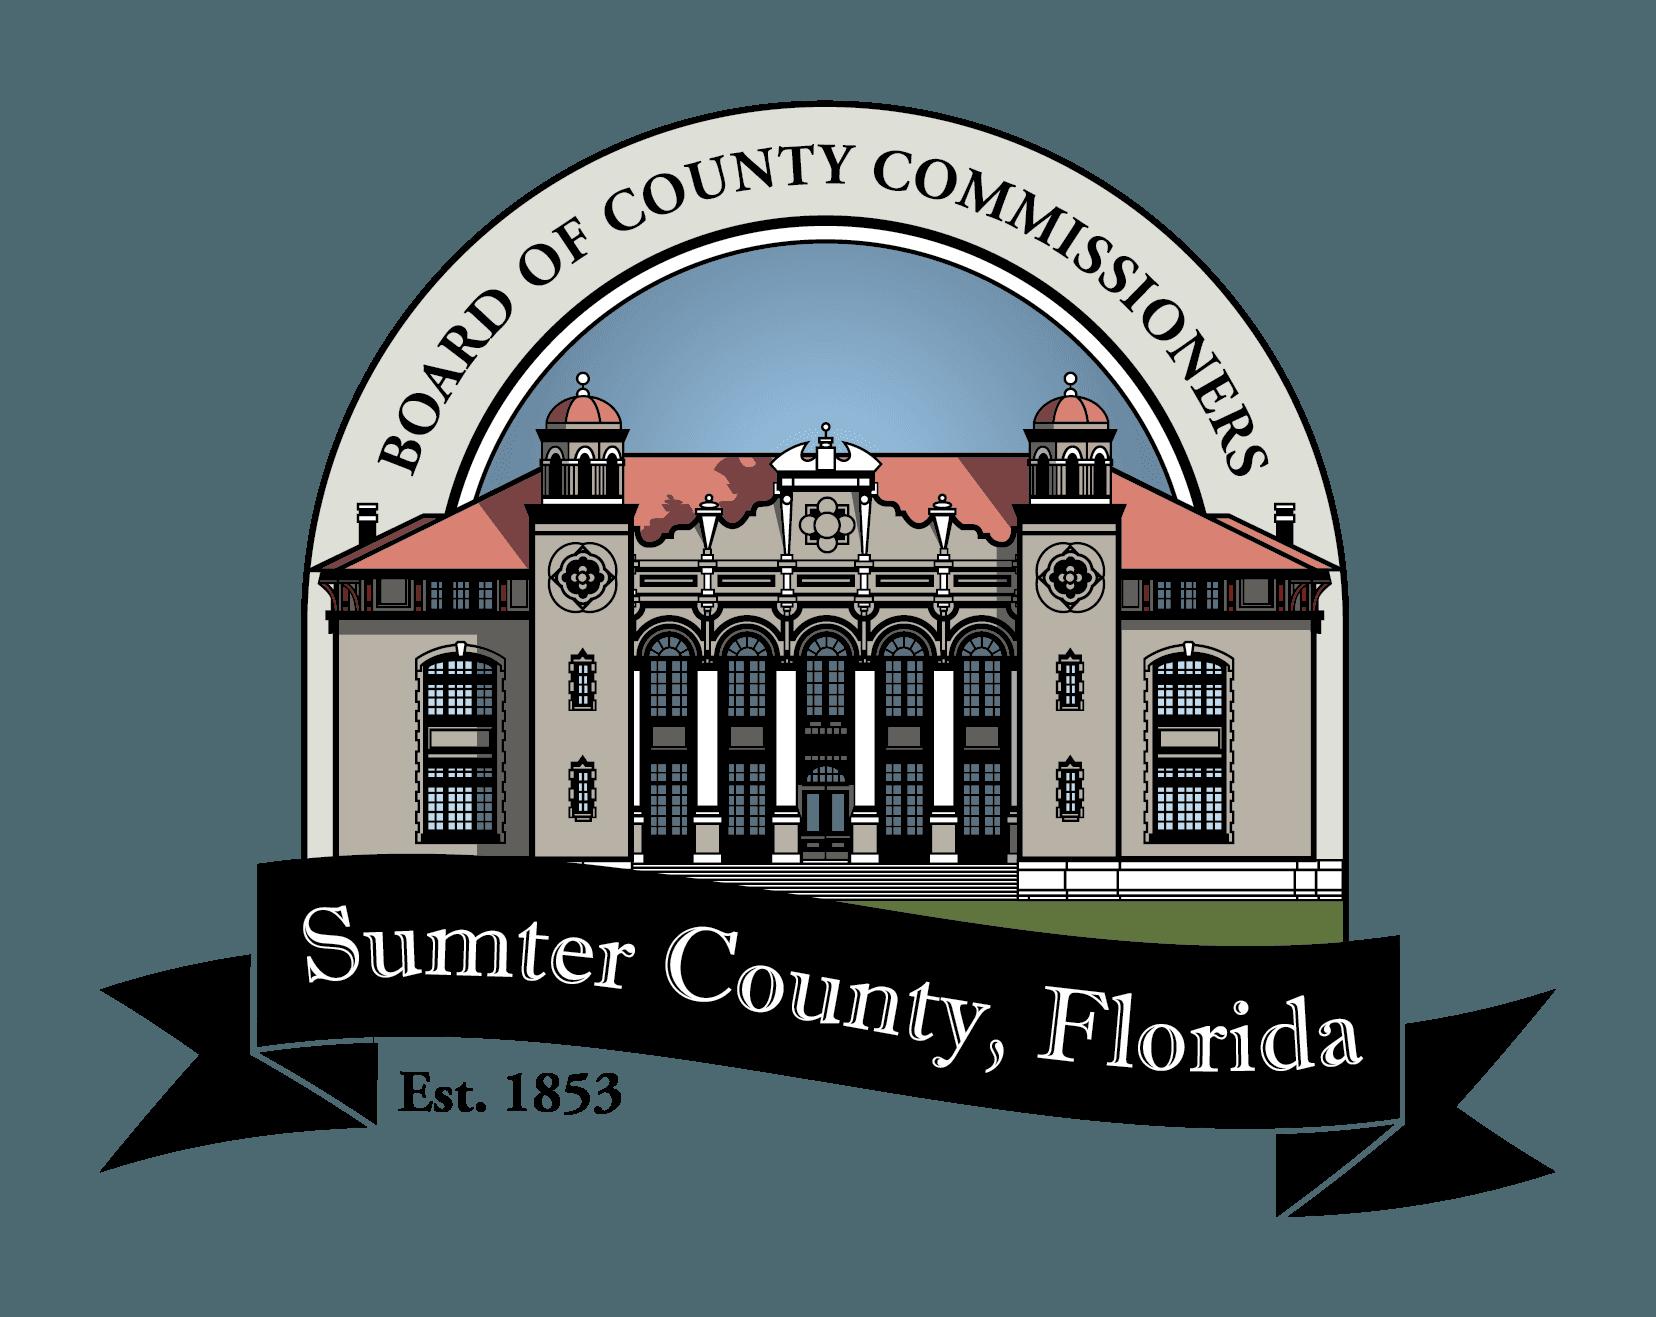 Sumter County logo